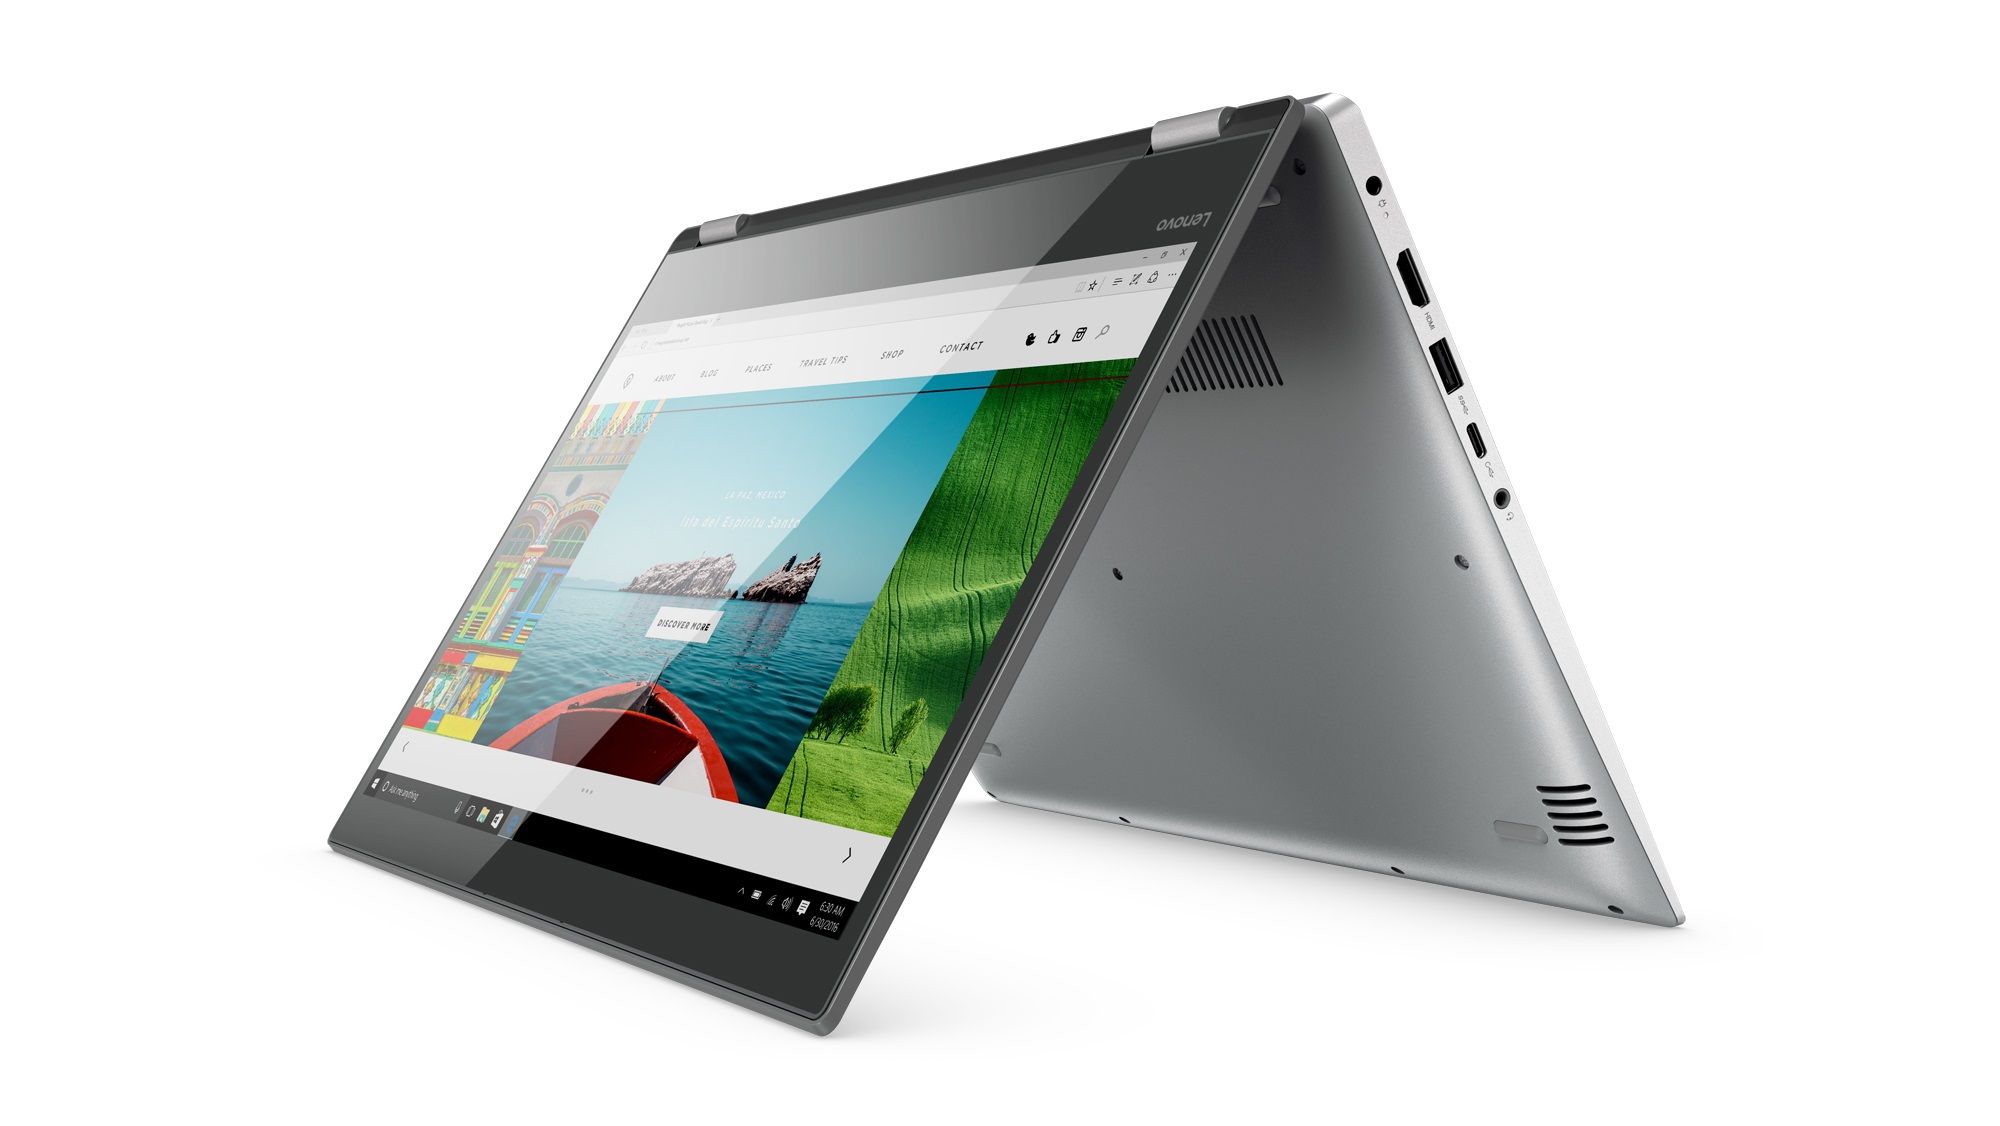 Experience next generation Lenovo laptops UQbqtLWSXrP7bBd7gEVv